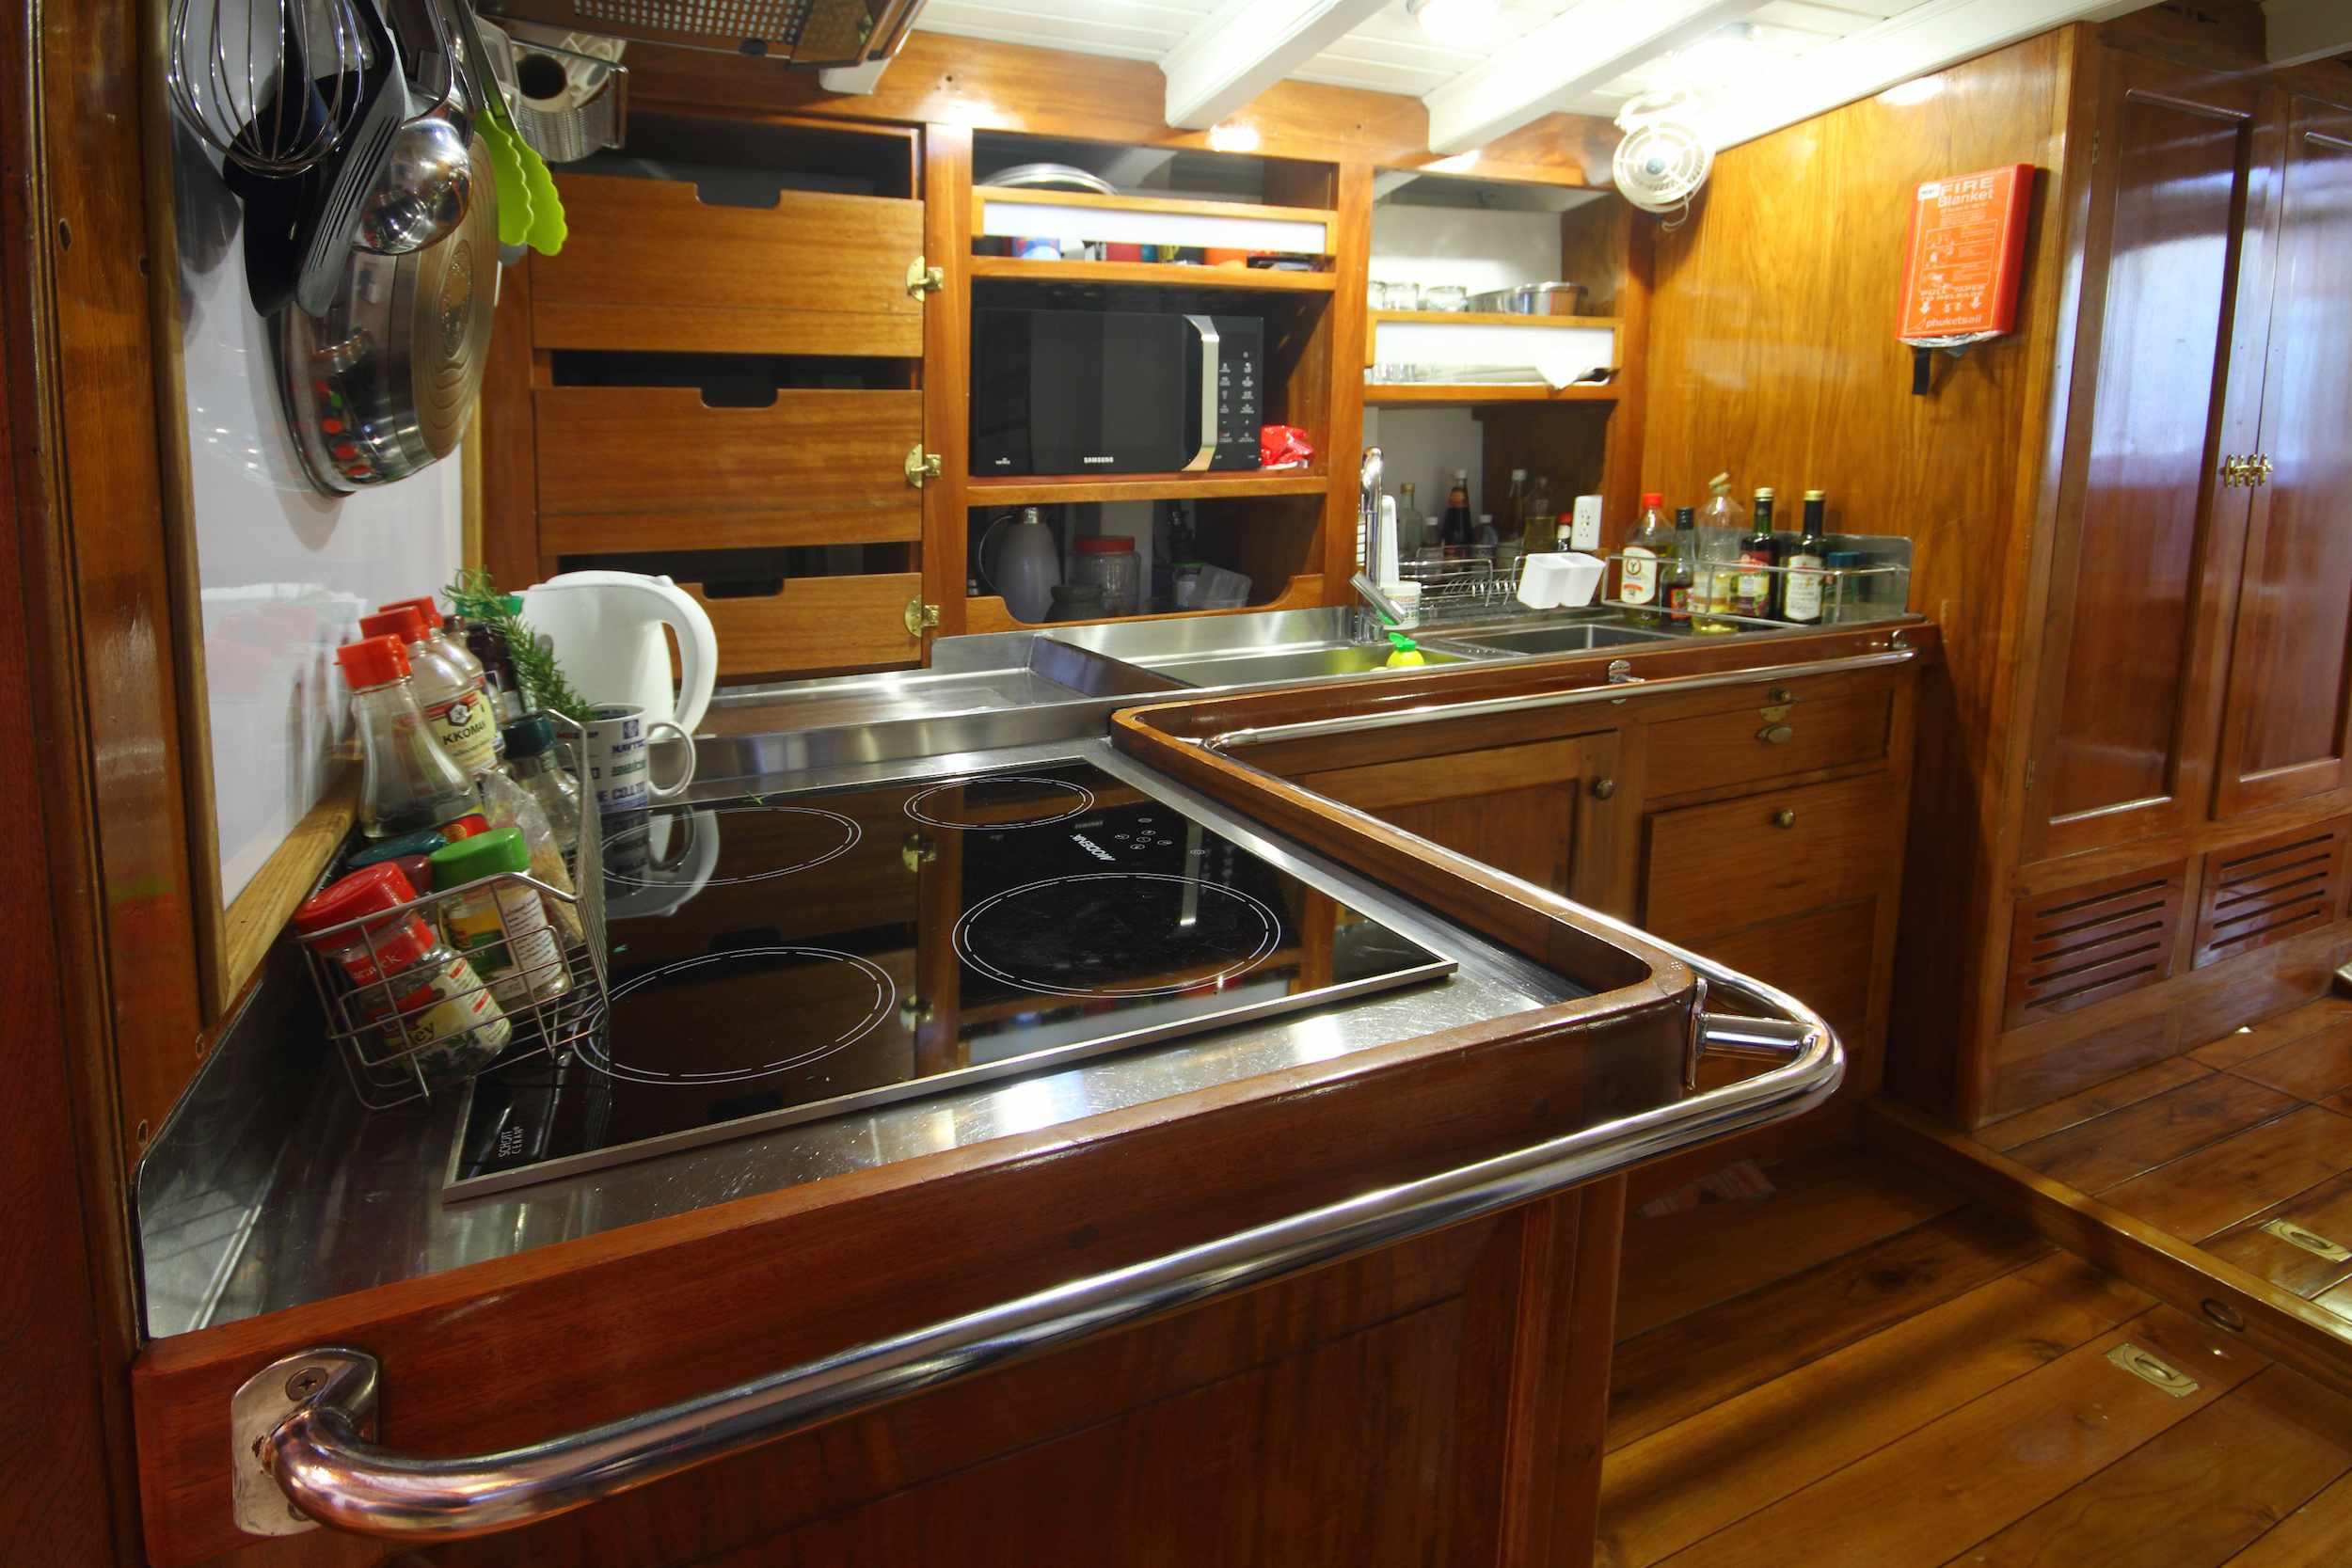 Aventure's sizable kitchen